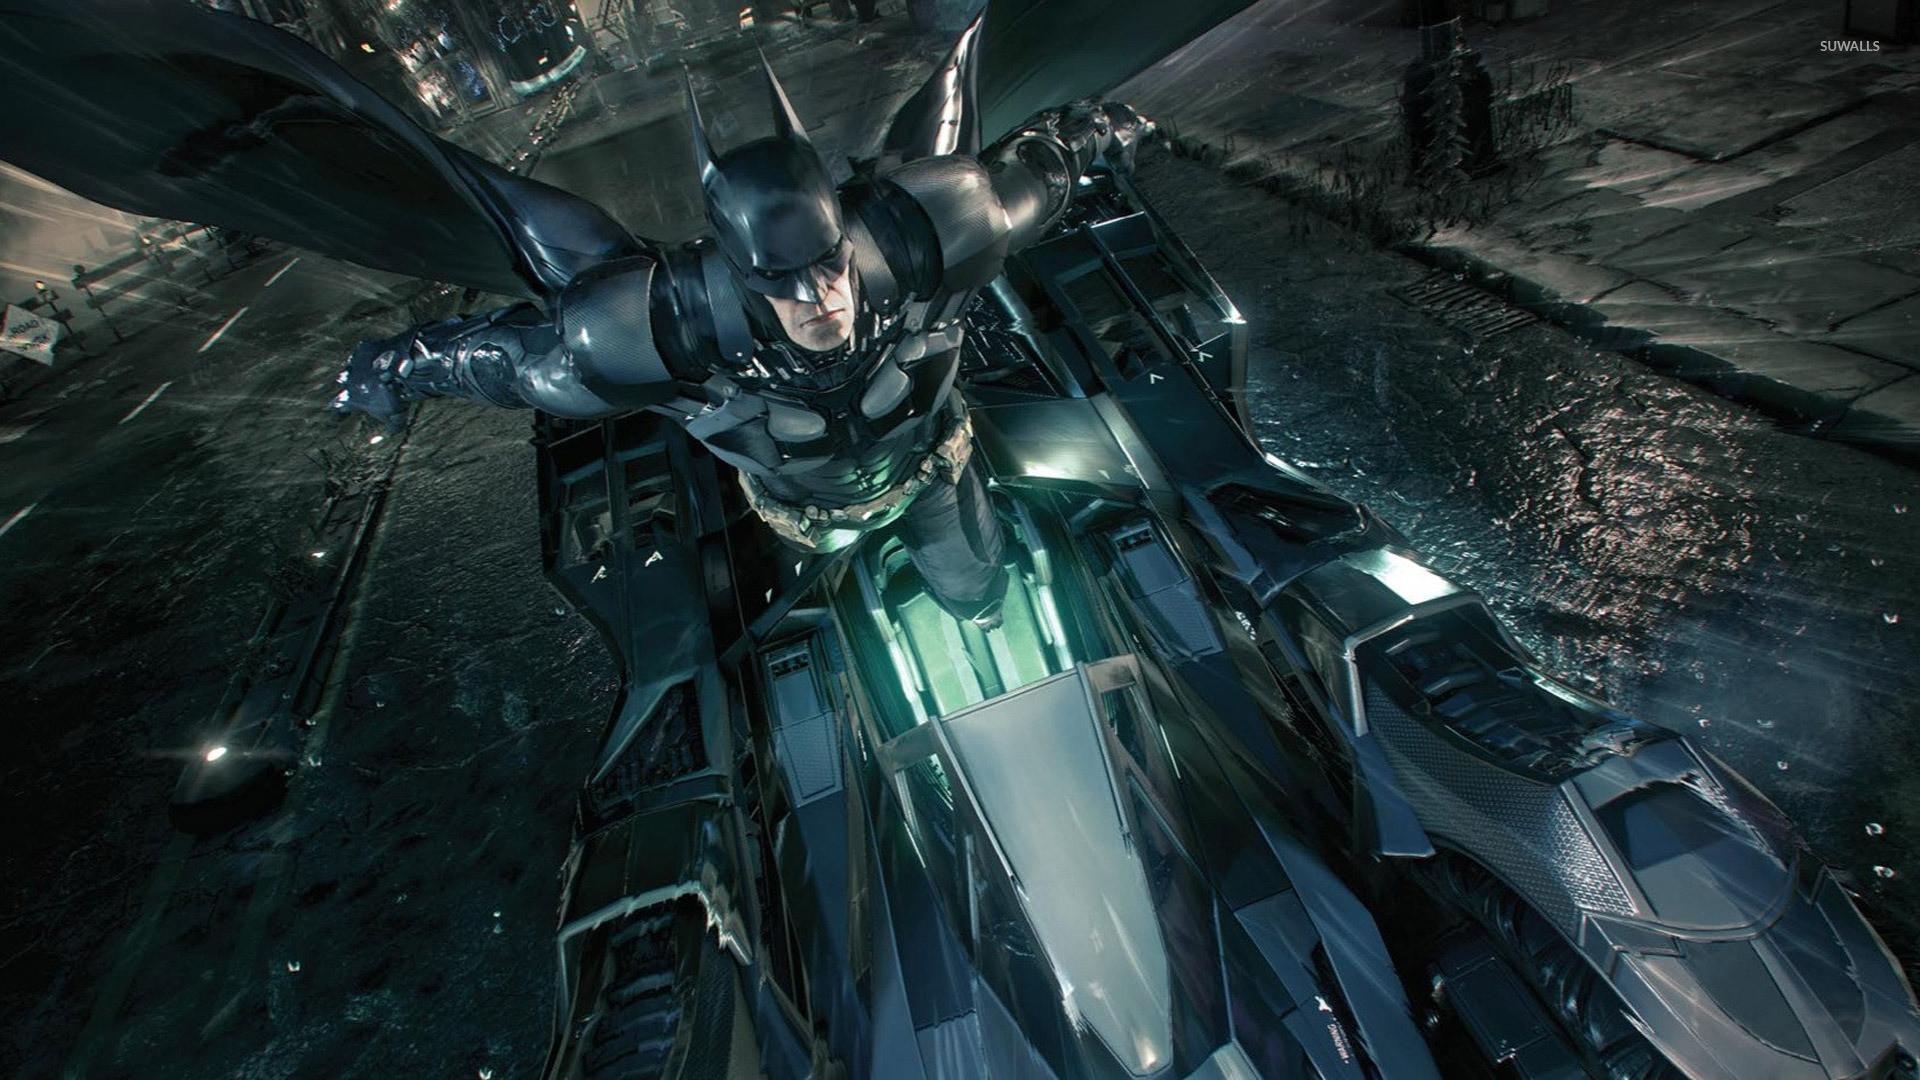 Batman Arkham Knight Wallpapers Batman Arkham Knight 60240